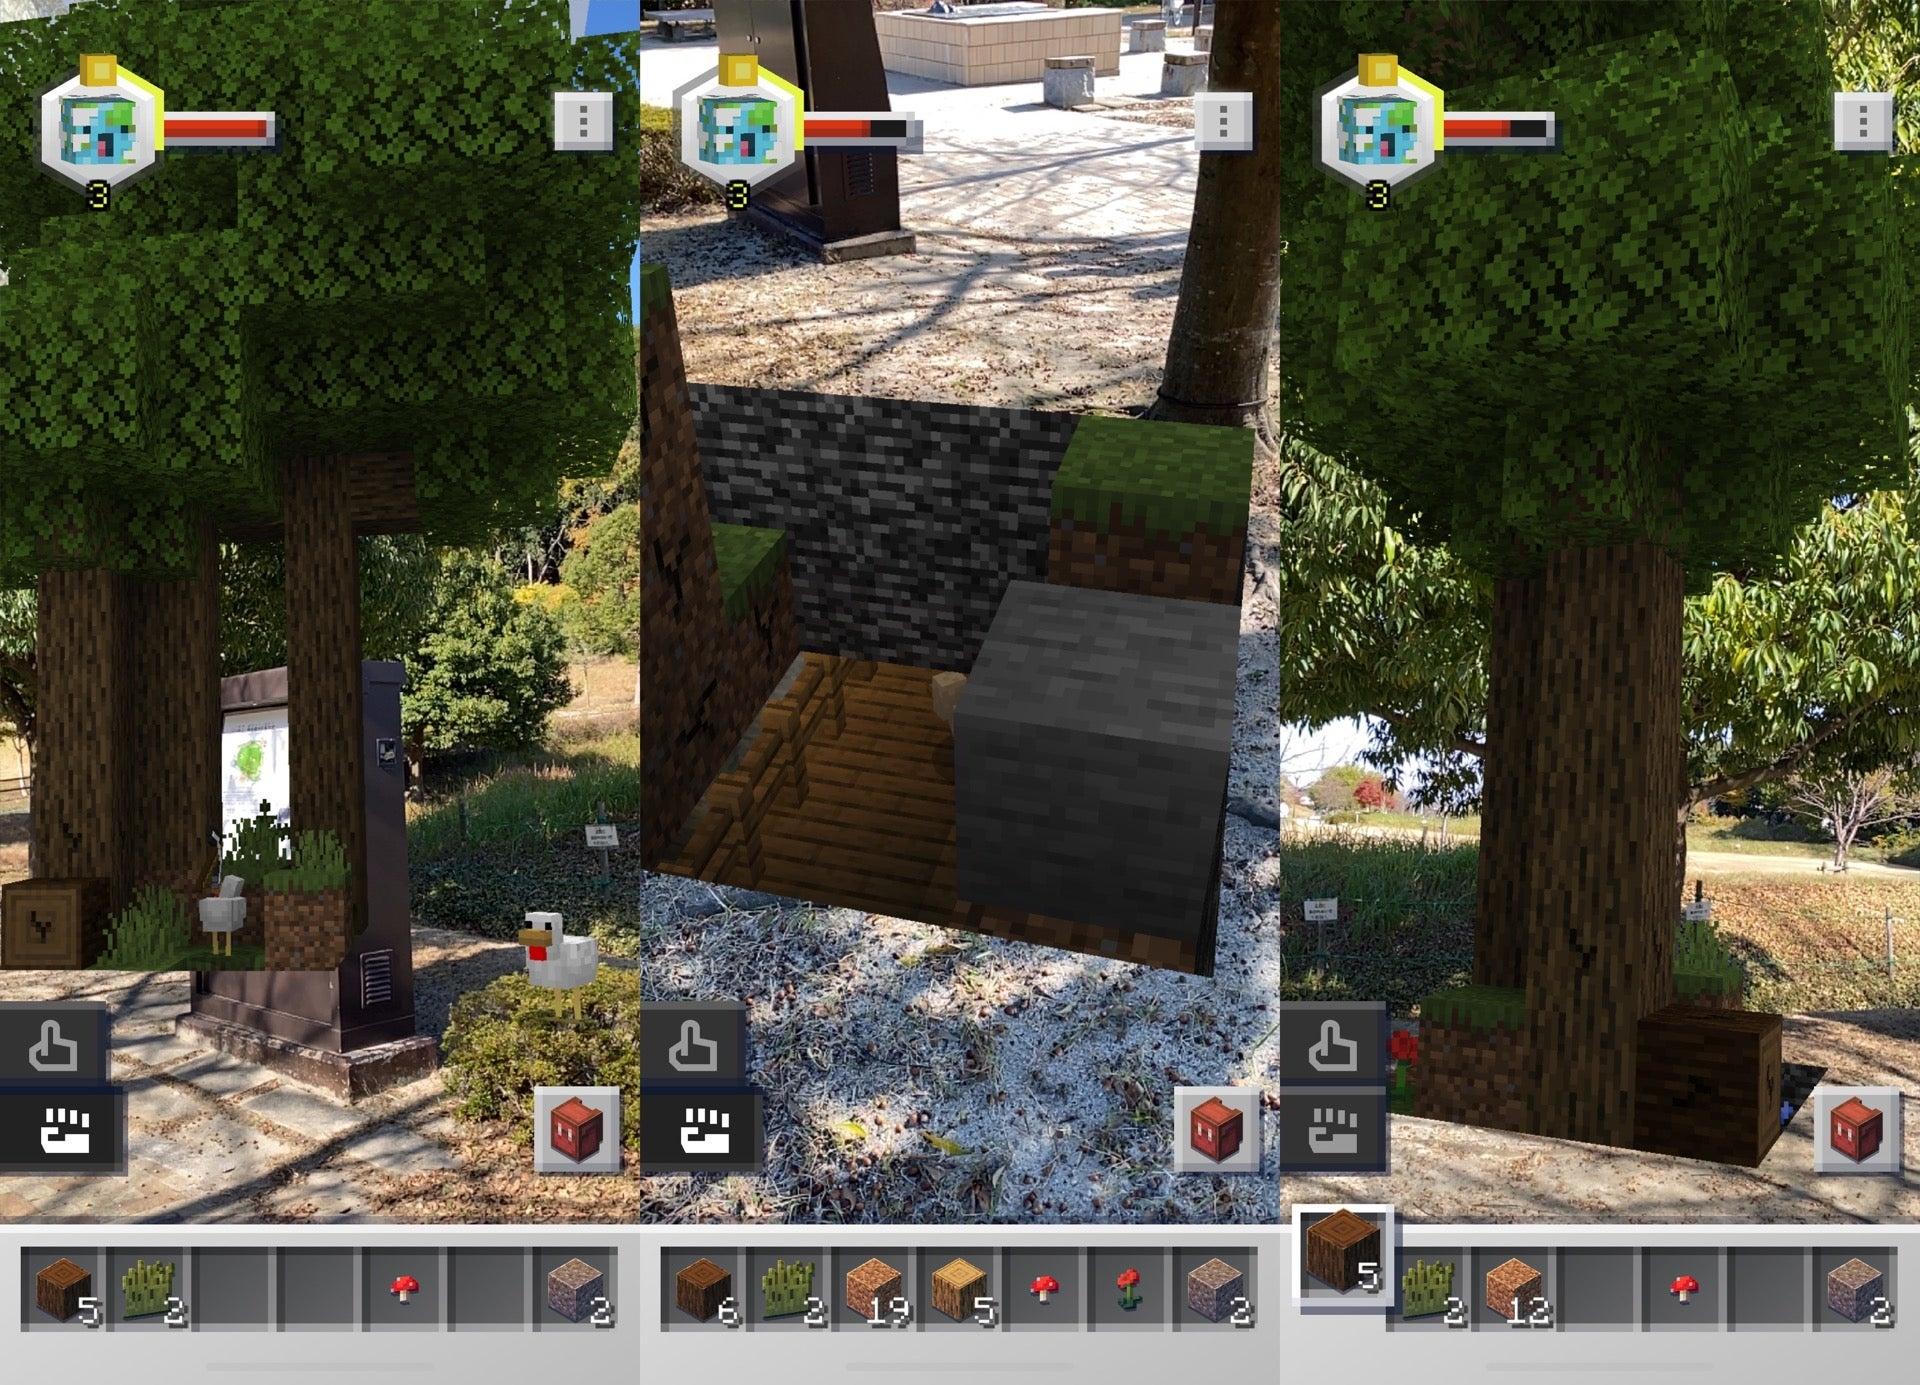 Minecraft Earth で木の場所にARの木が( ゚∀゚) 掘っていくと地下がある。 (@ 小牧山史跡公園 in 小牧市, 愛知県) https://t.co/xypyMiE1Qz https://t.co/juTjgKwQfV